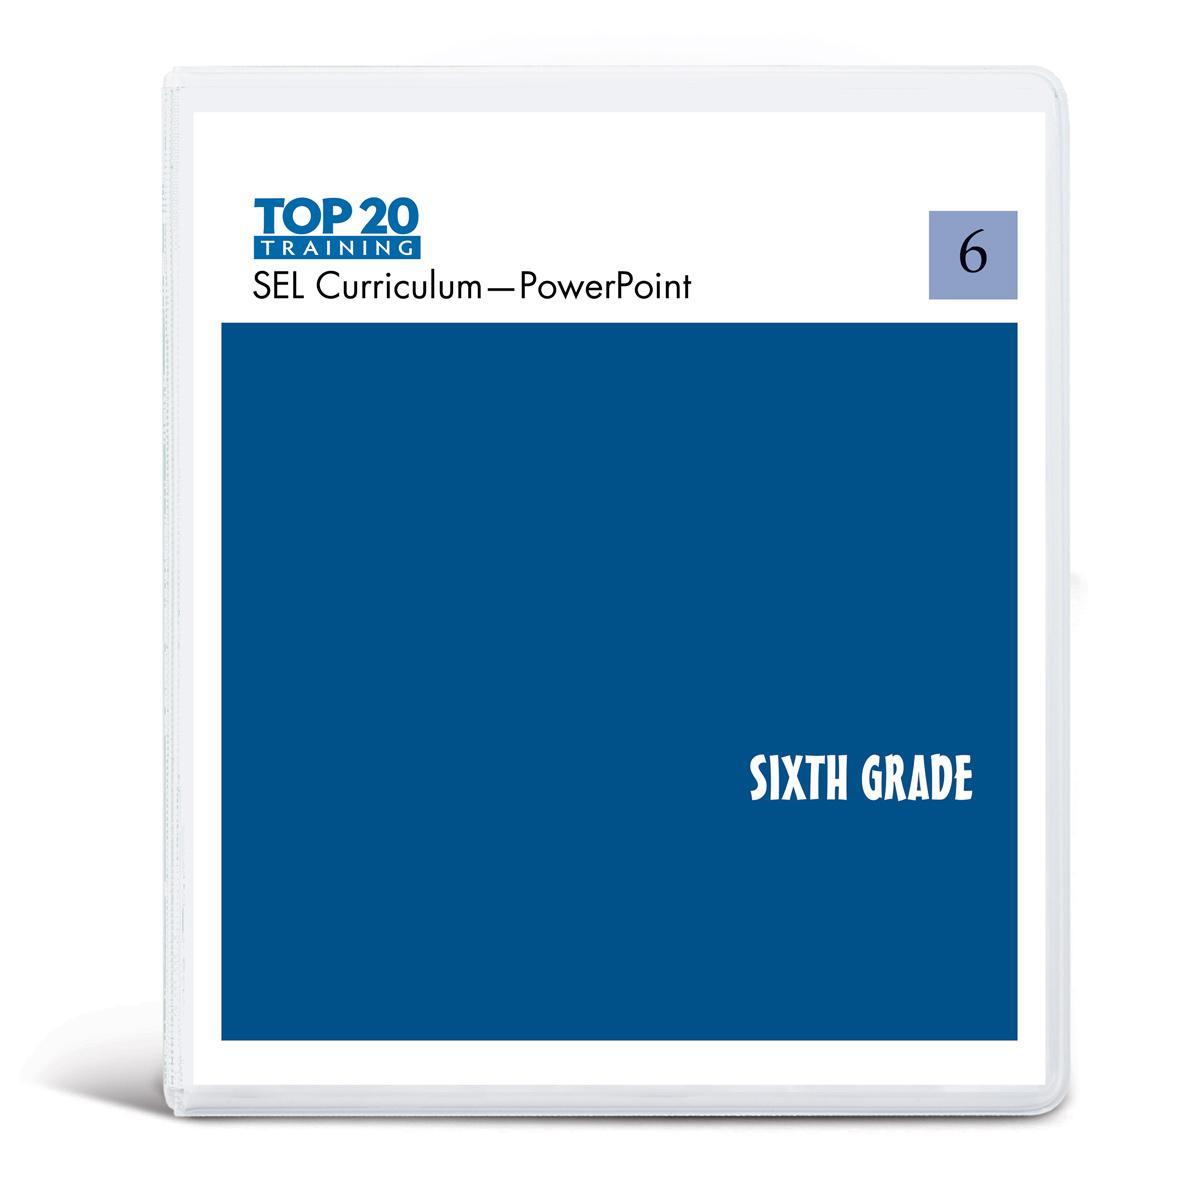 Top 20 teachers PowerPoint curriculum for sixth grade